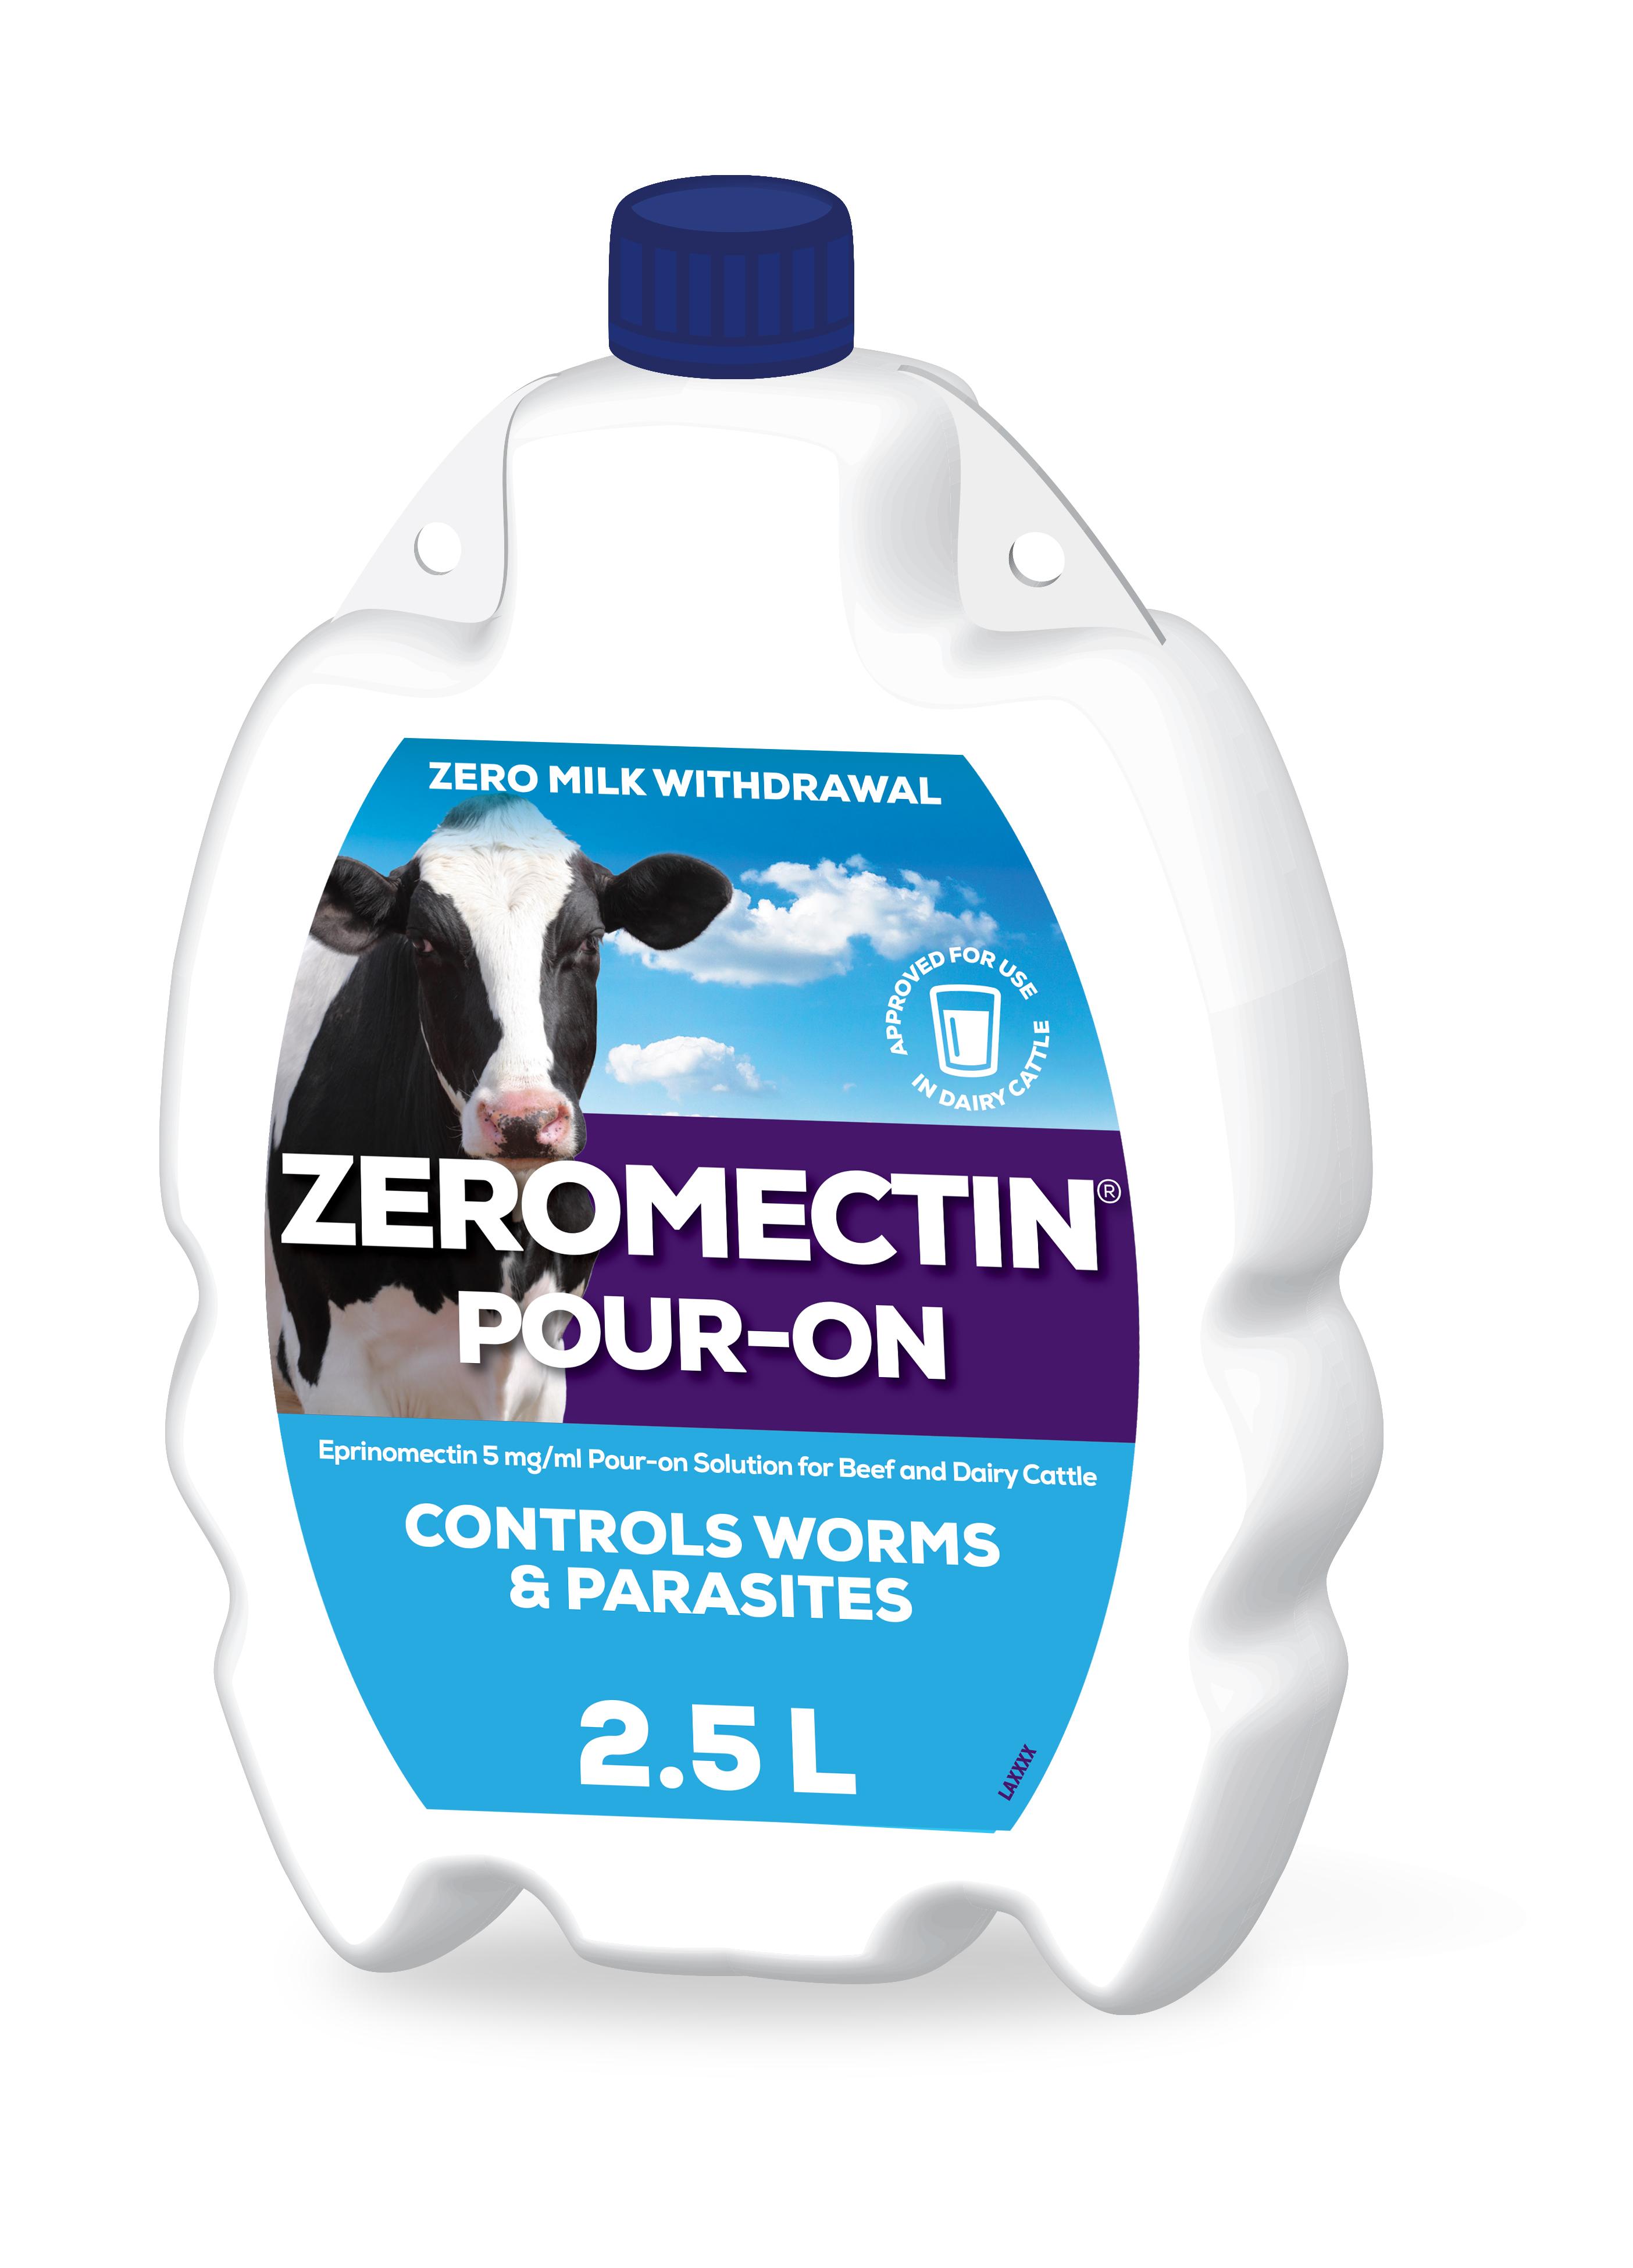 Zeromectin